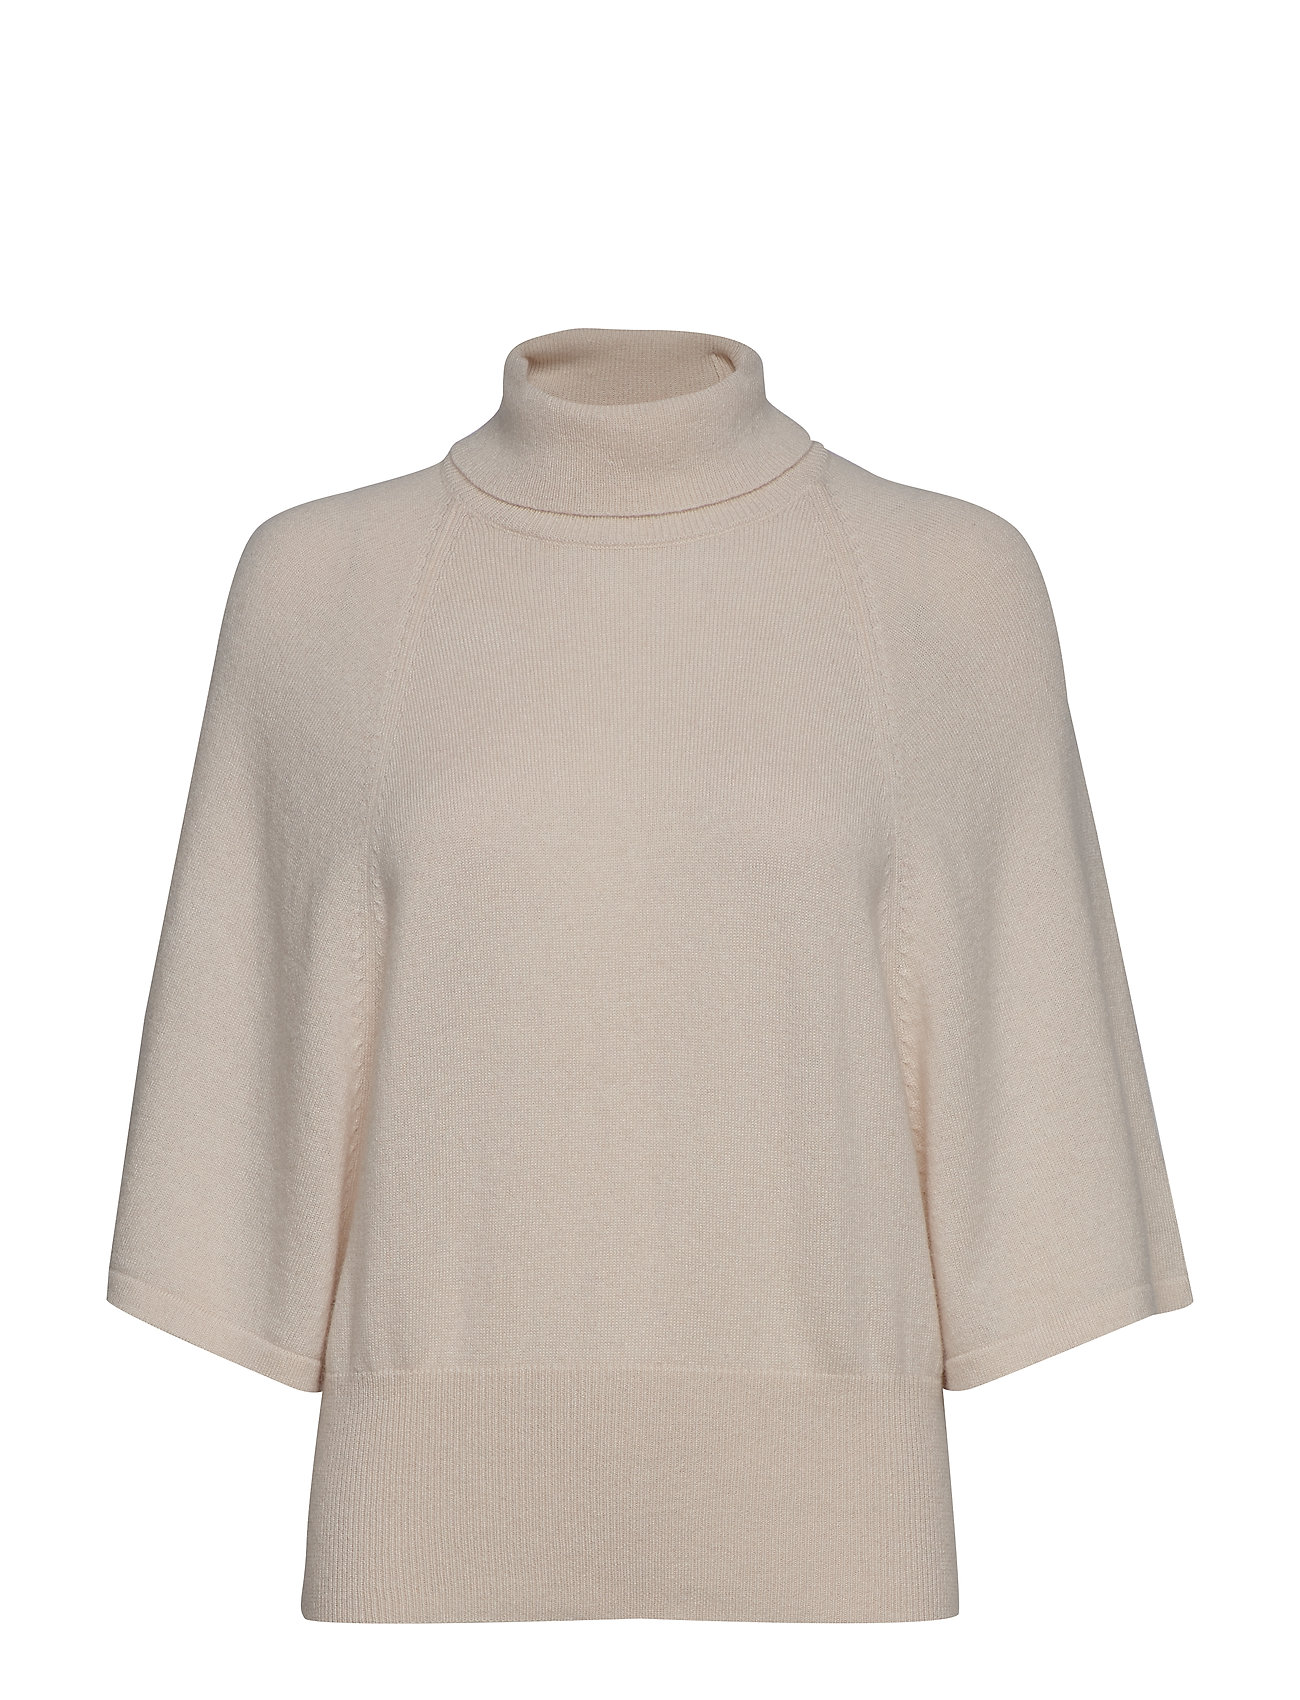 InWear IrisIW Turtleneck Pullover - FRENCH NOUGAT